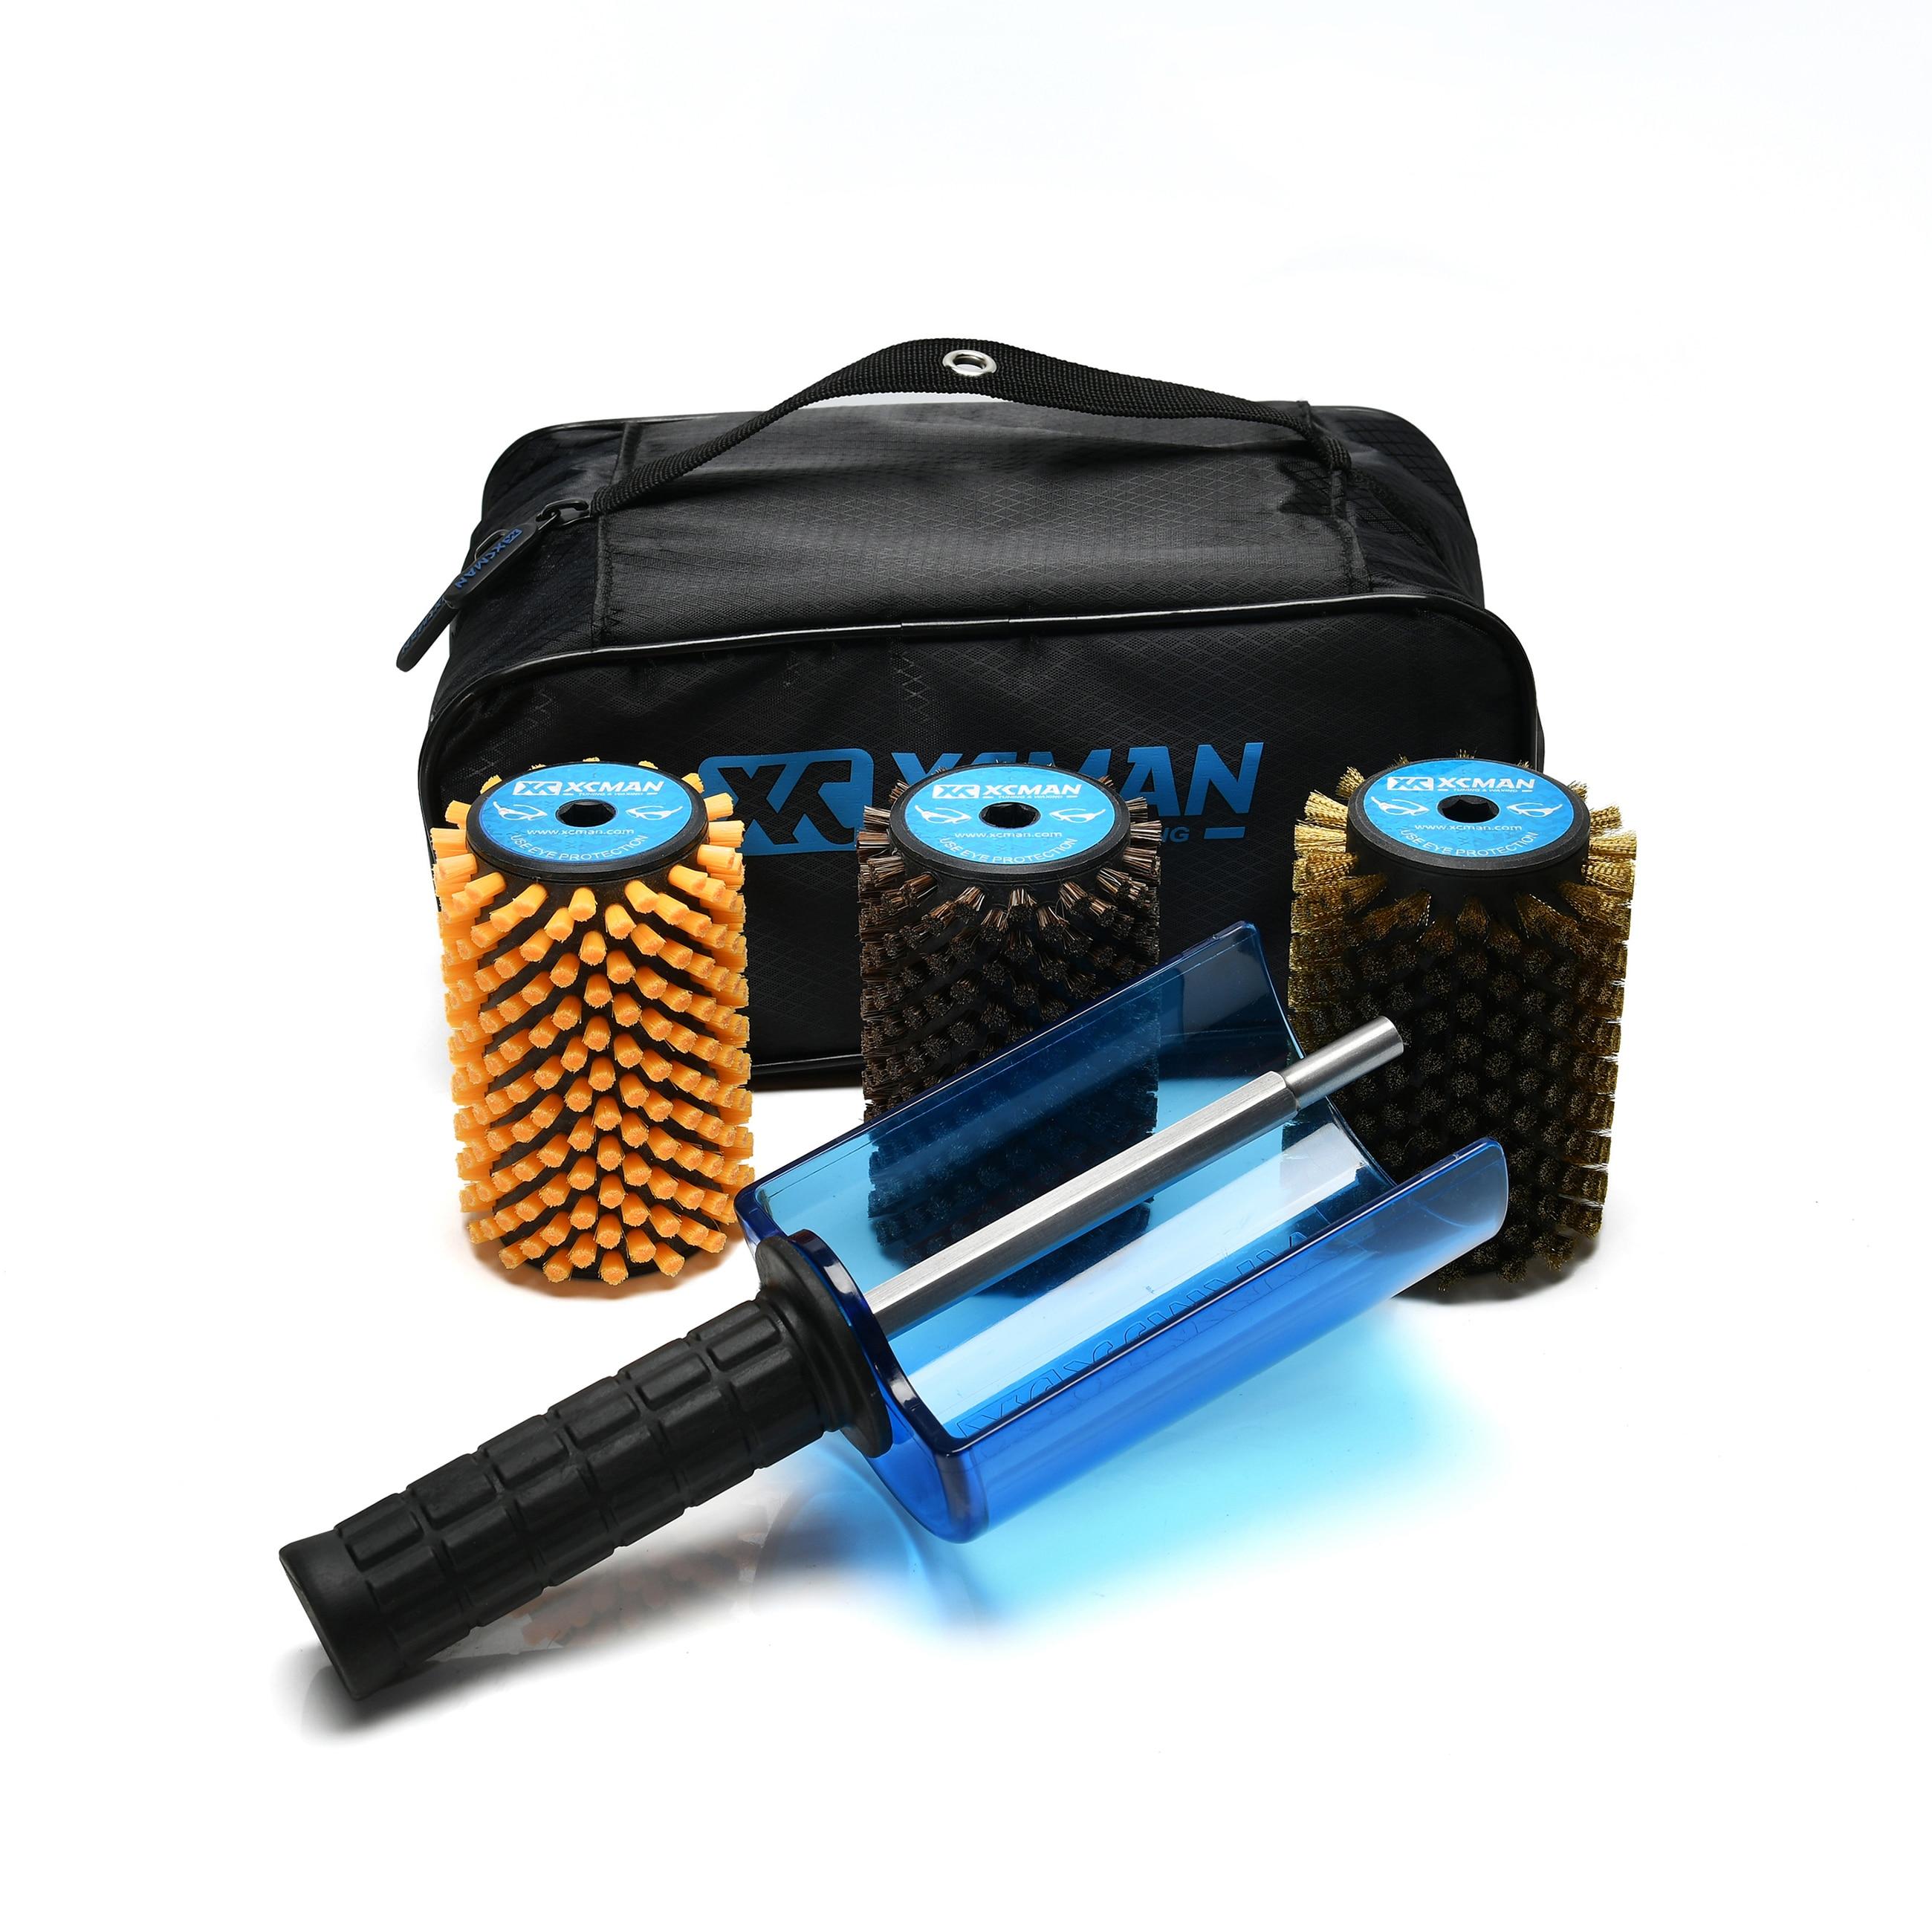 XCMAN Ski Roto Brush Kit Roto Brush Controller Handle with all 3 Brushes: Nylon, Horsehair, Brass/Cork|Ski Poles| - AliExpress